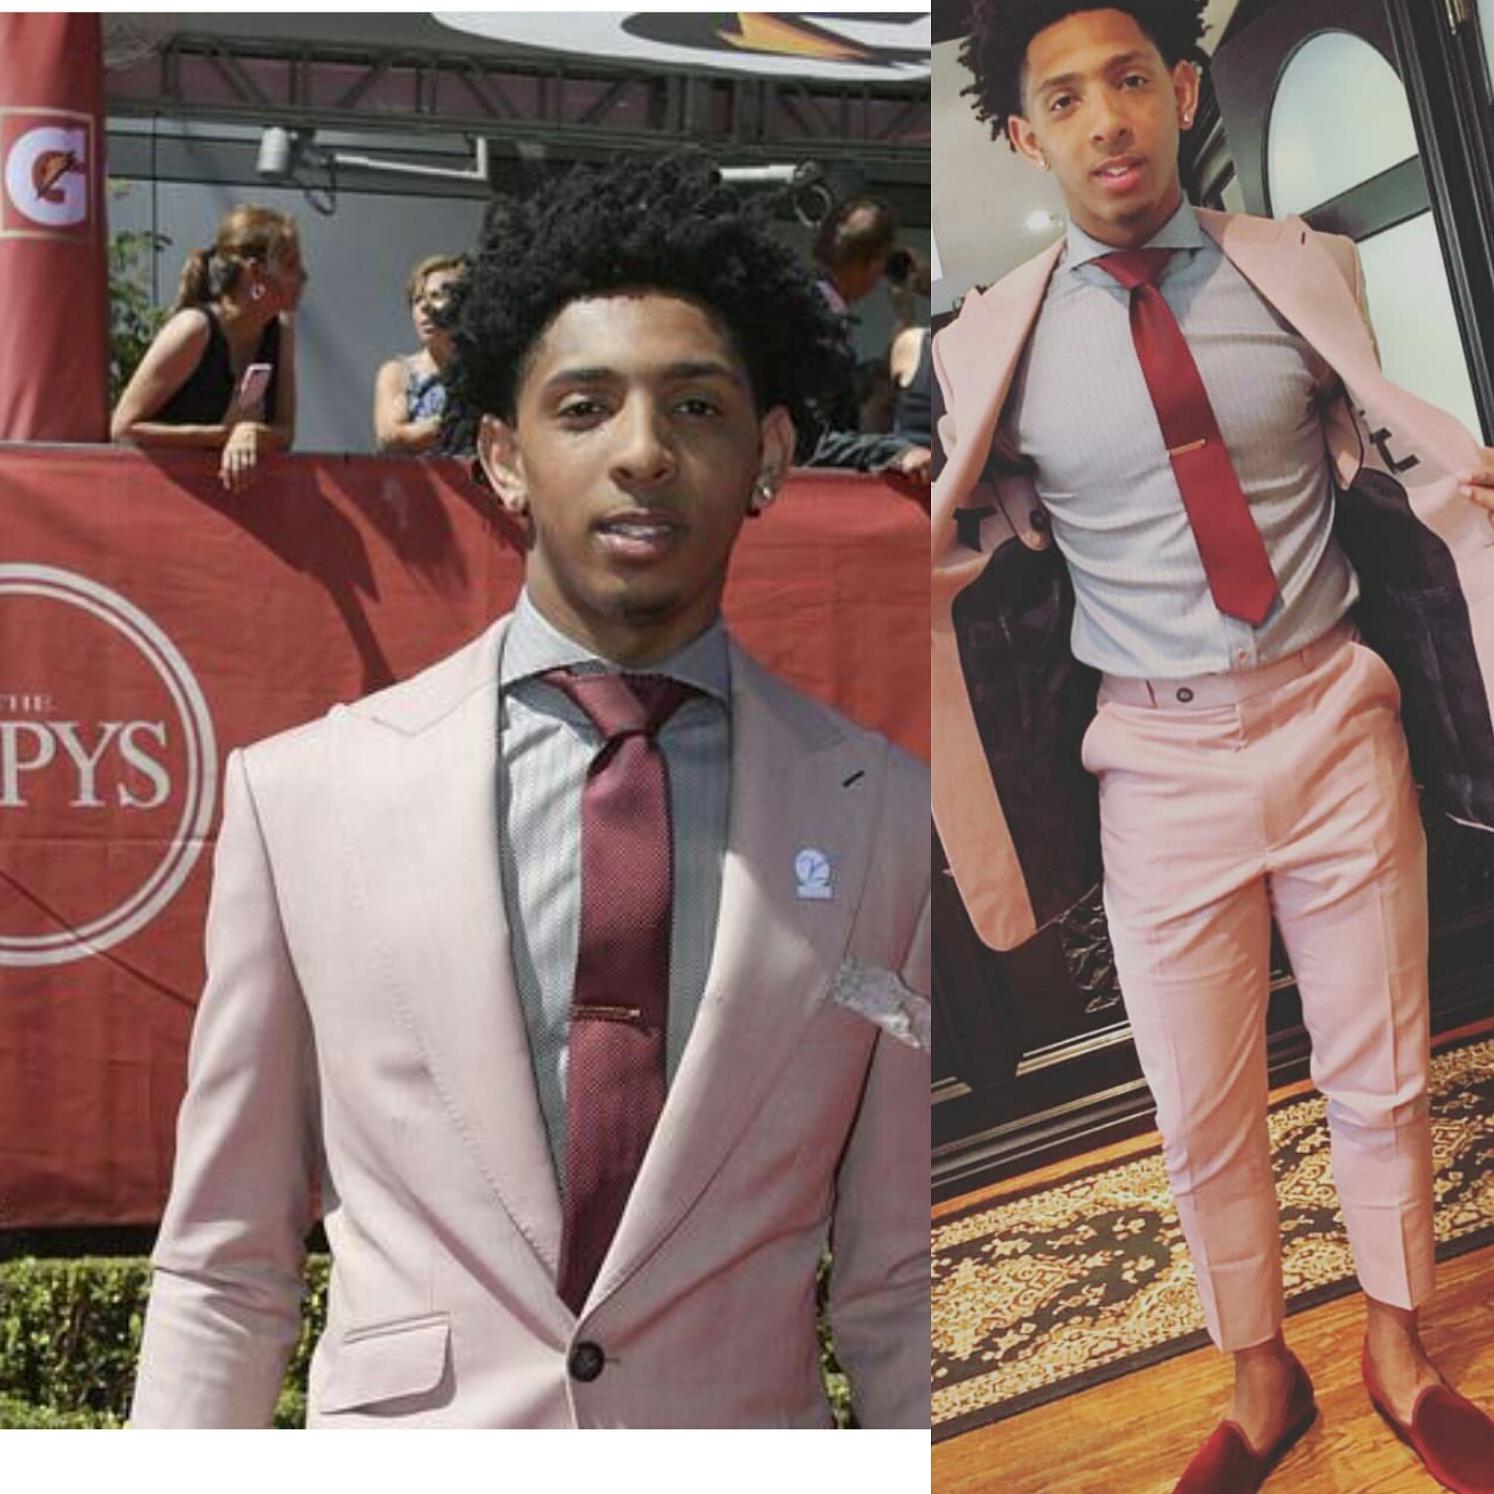 Cameron-Payne-2016-ESPYS-suit